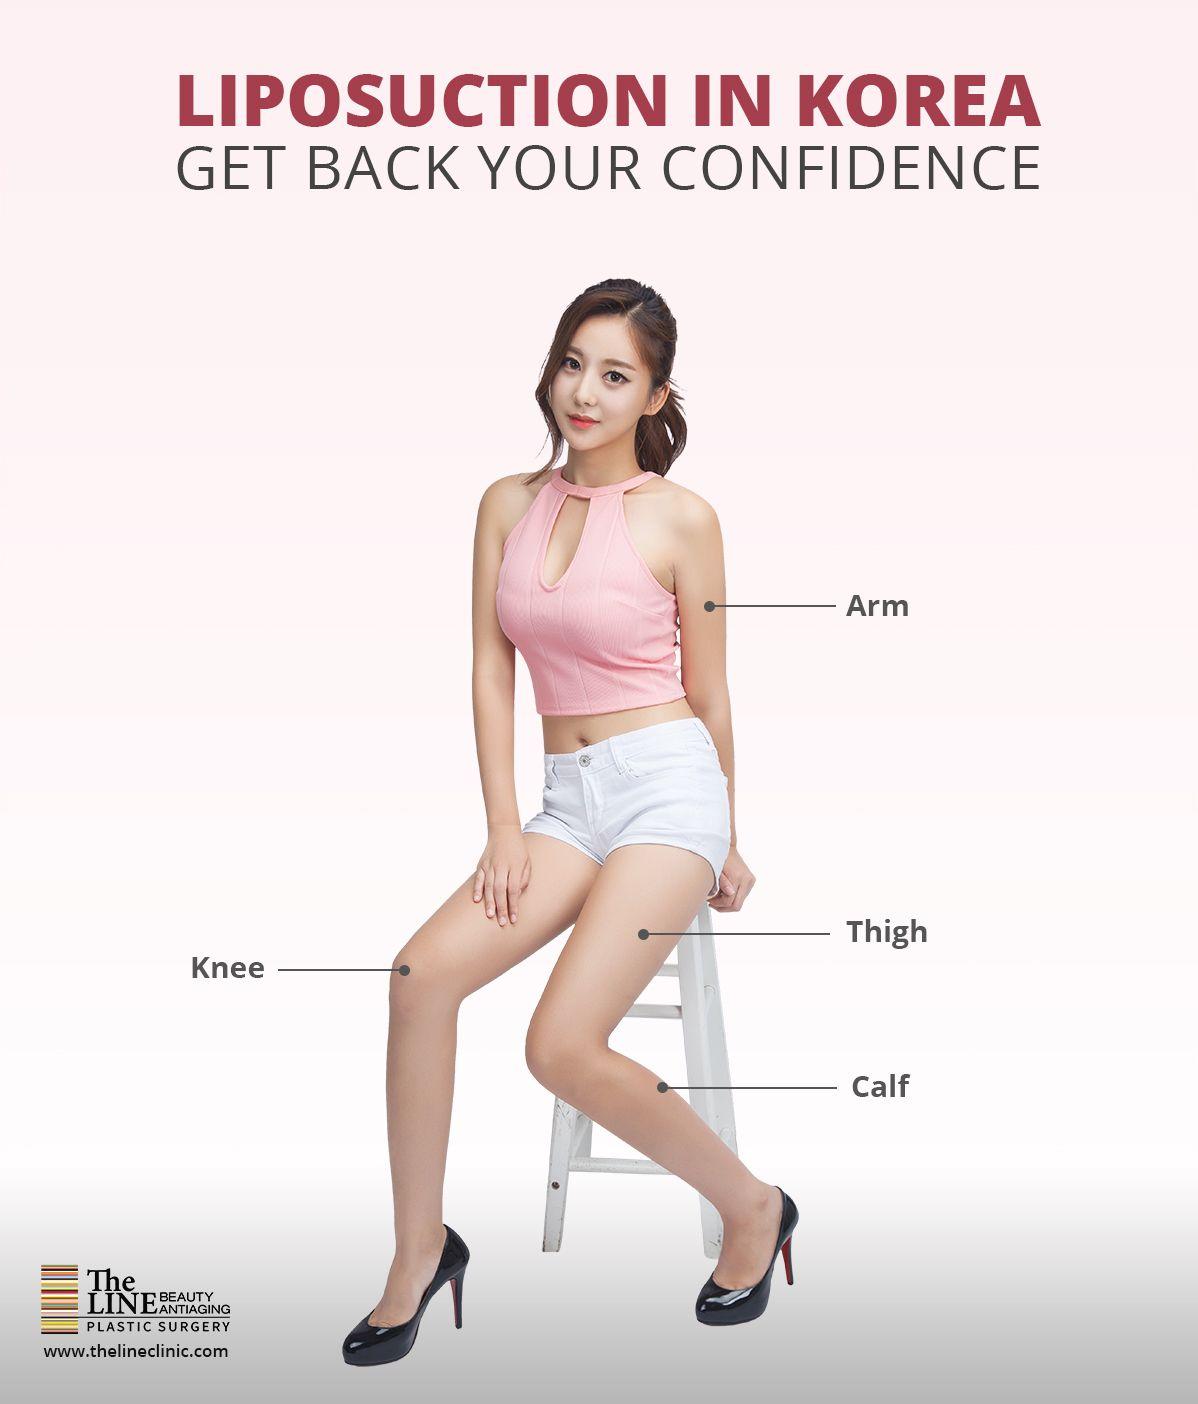 Abdomen Thigh Arm Liposuction Surgery In Korea Liposuction Arm Liposuction Thigh Liposuction